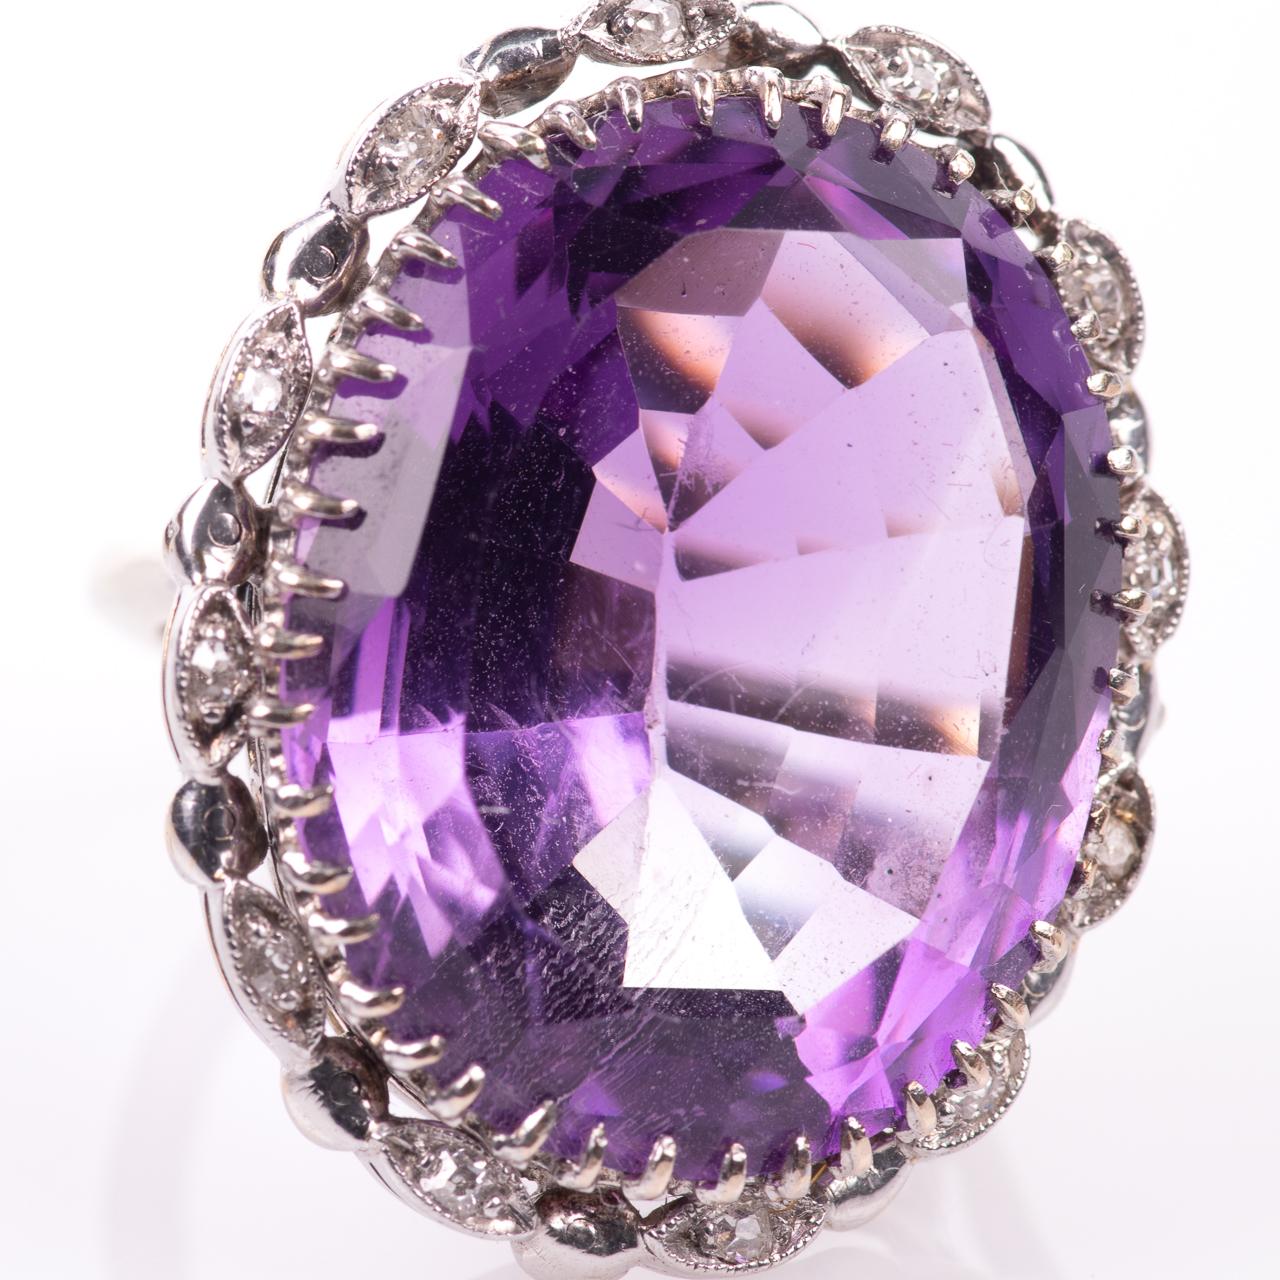 30ct Amethyst & Diamond Ring - Image 3 of 6